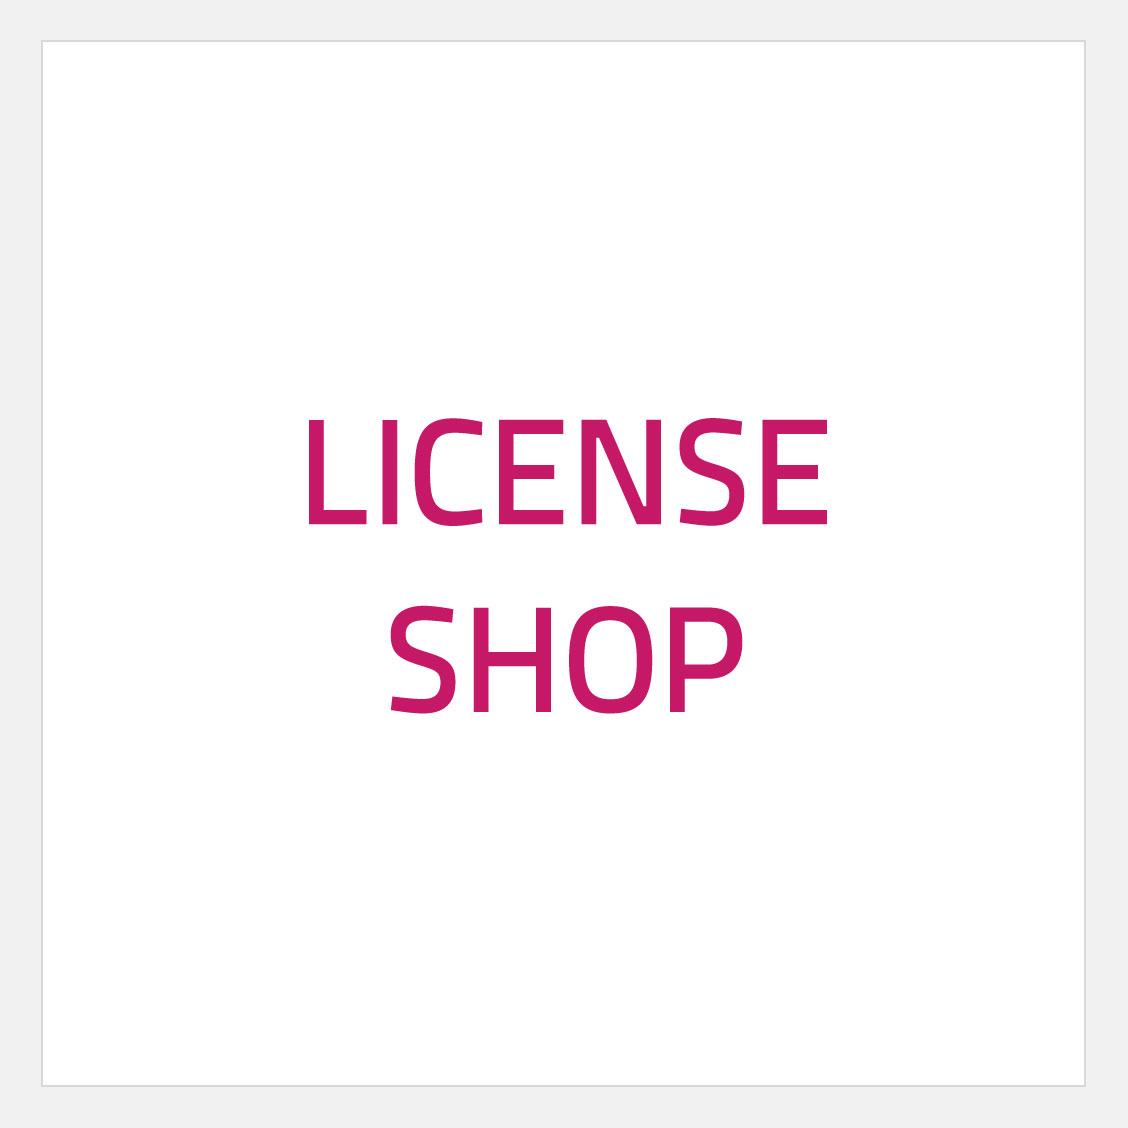 License shop